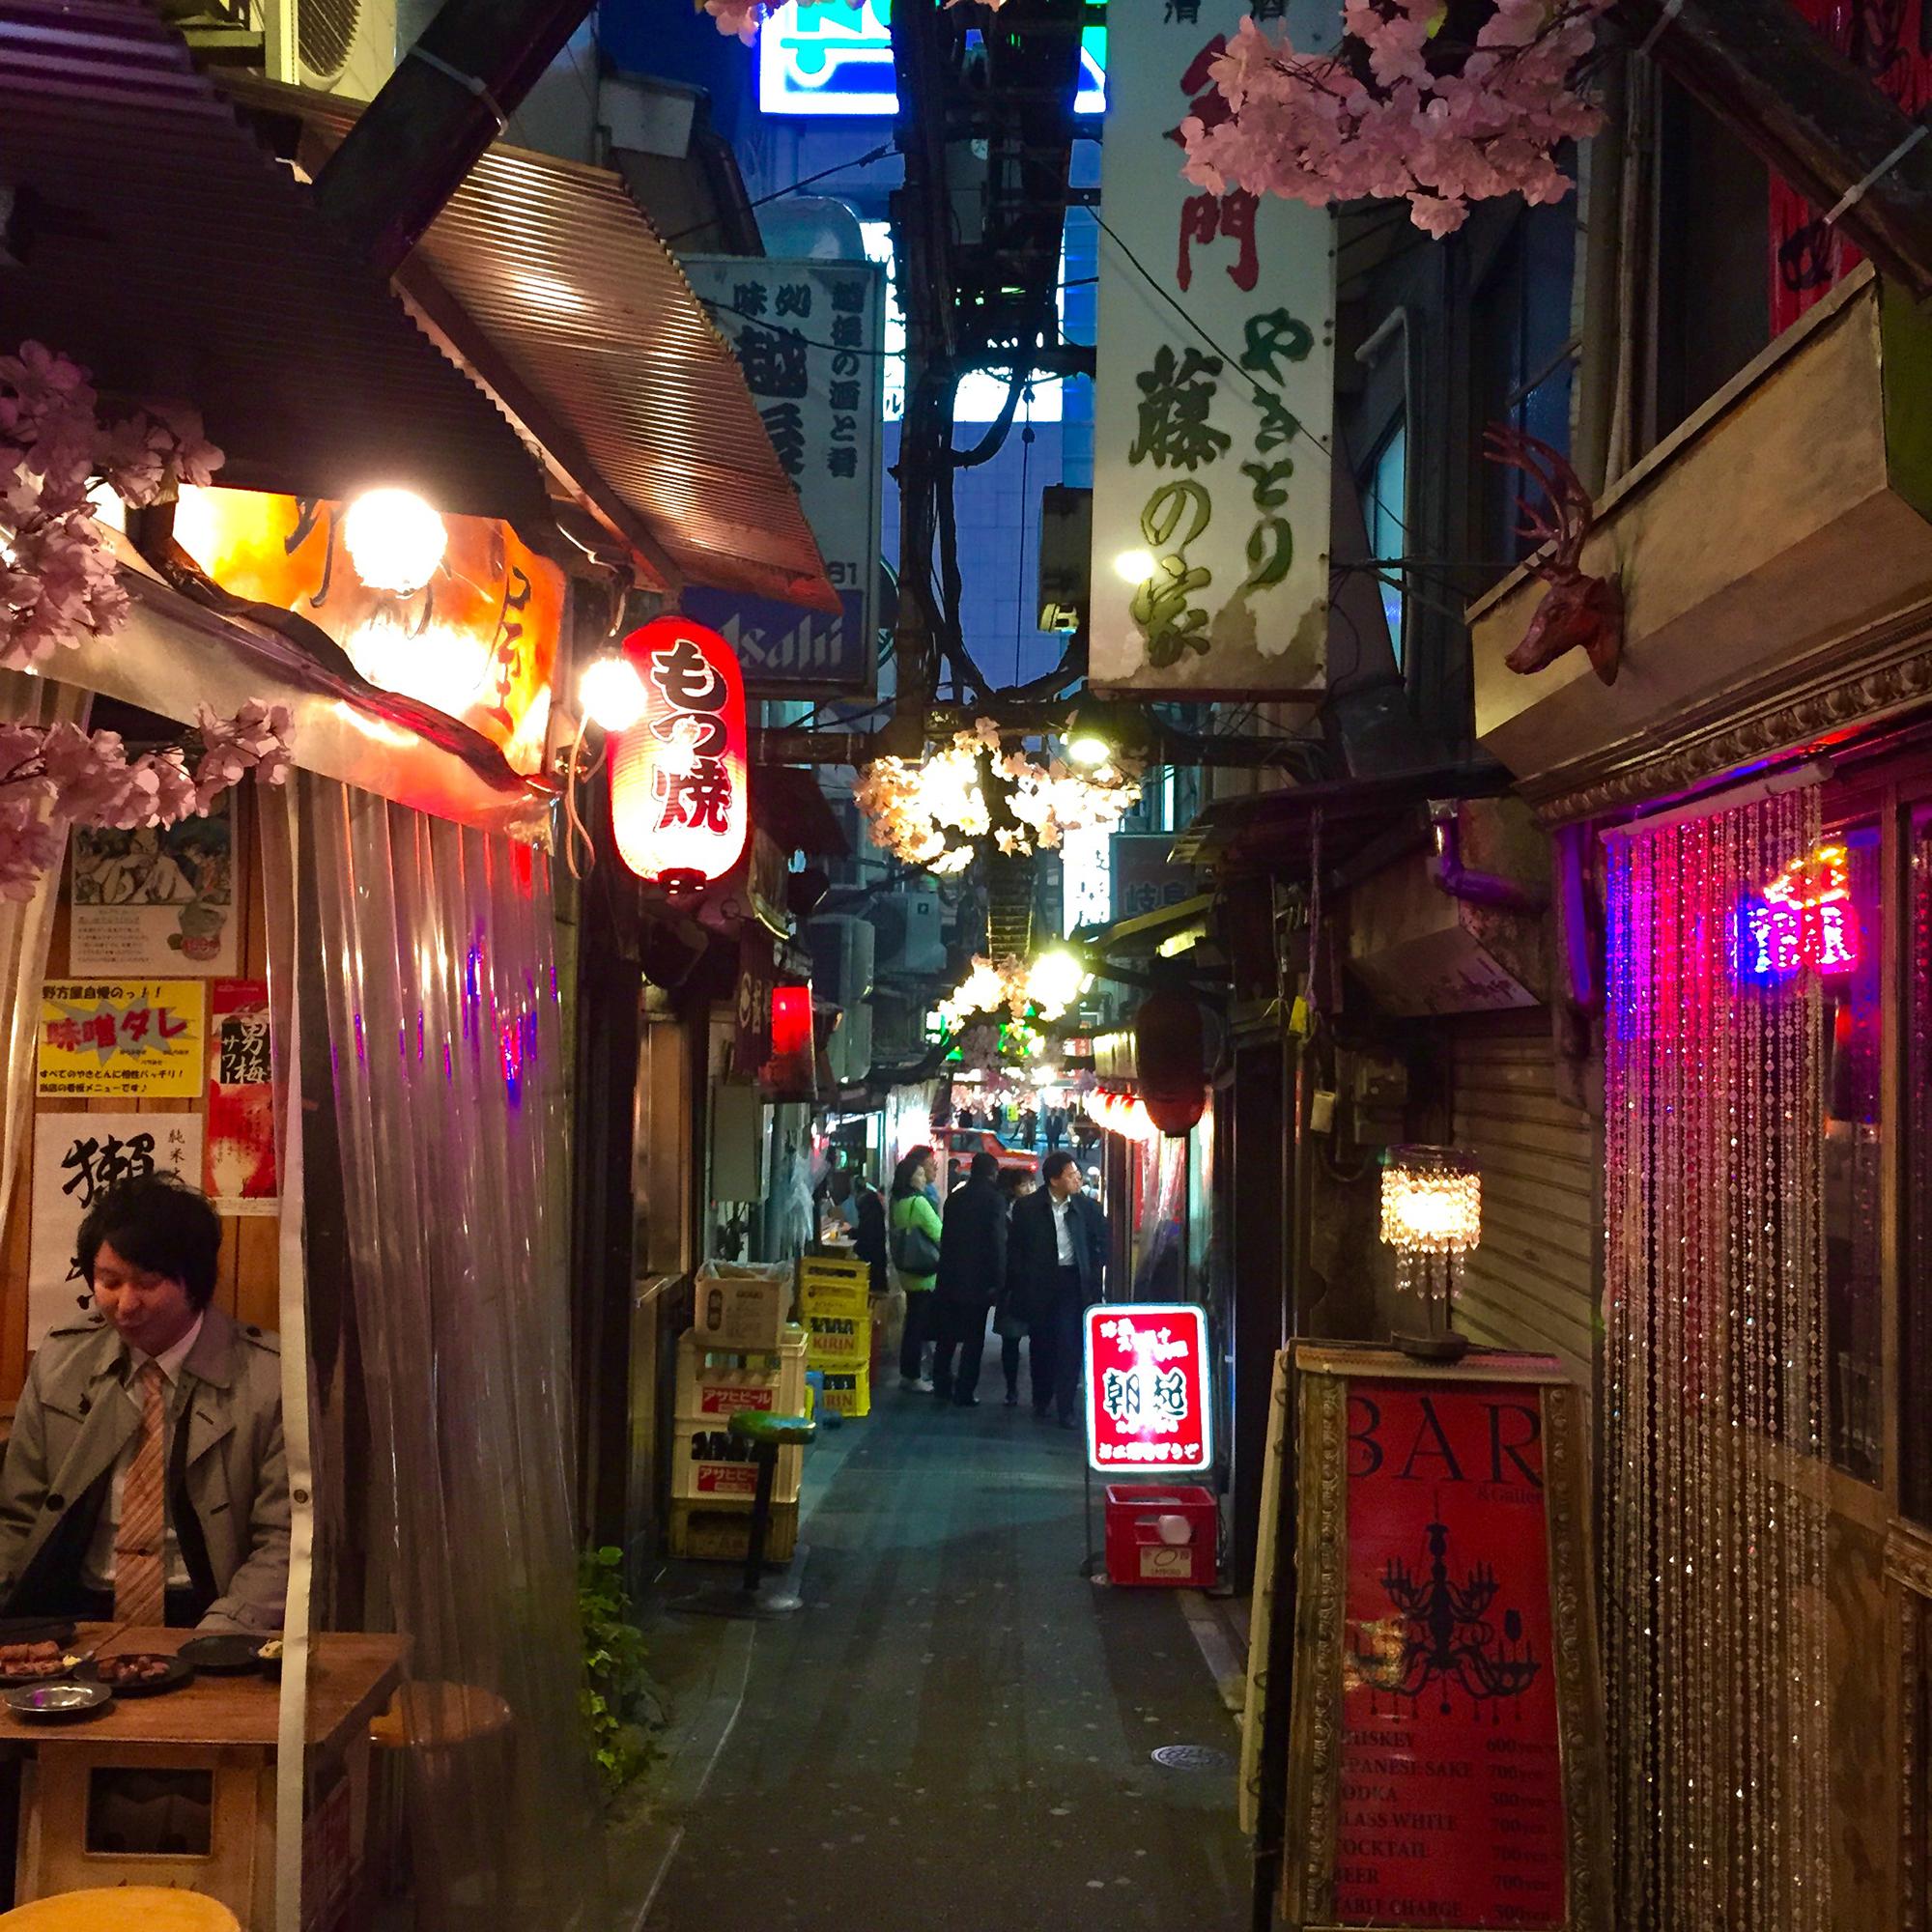 A quiet alley next to Shinjuku station.